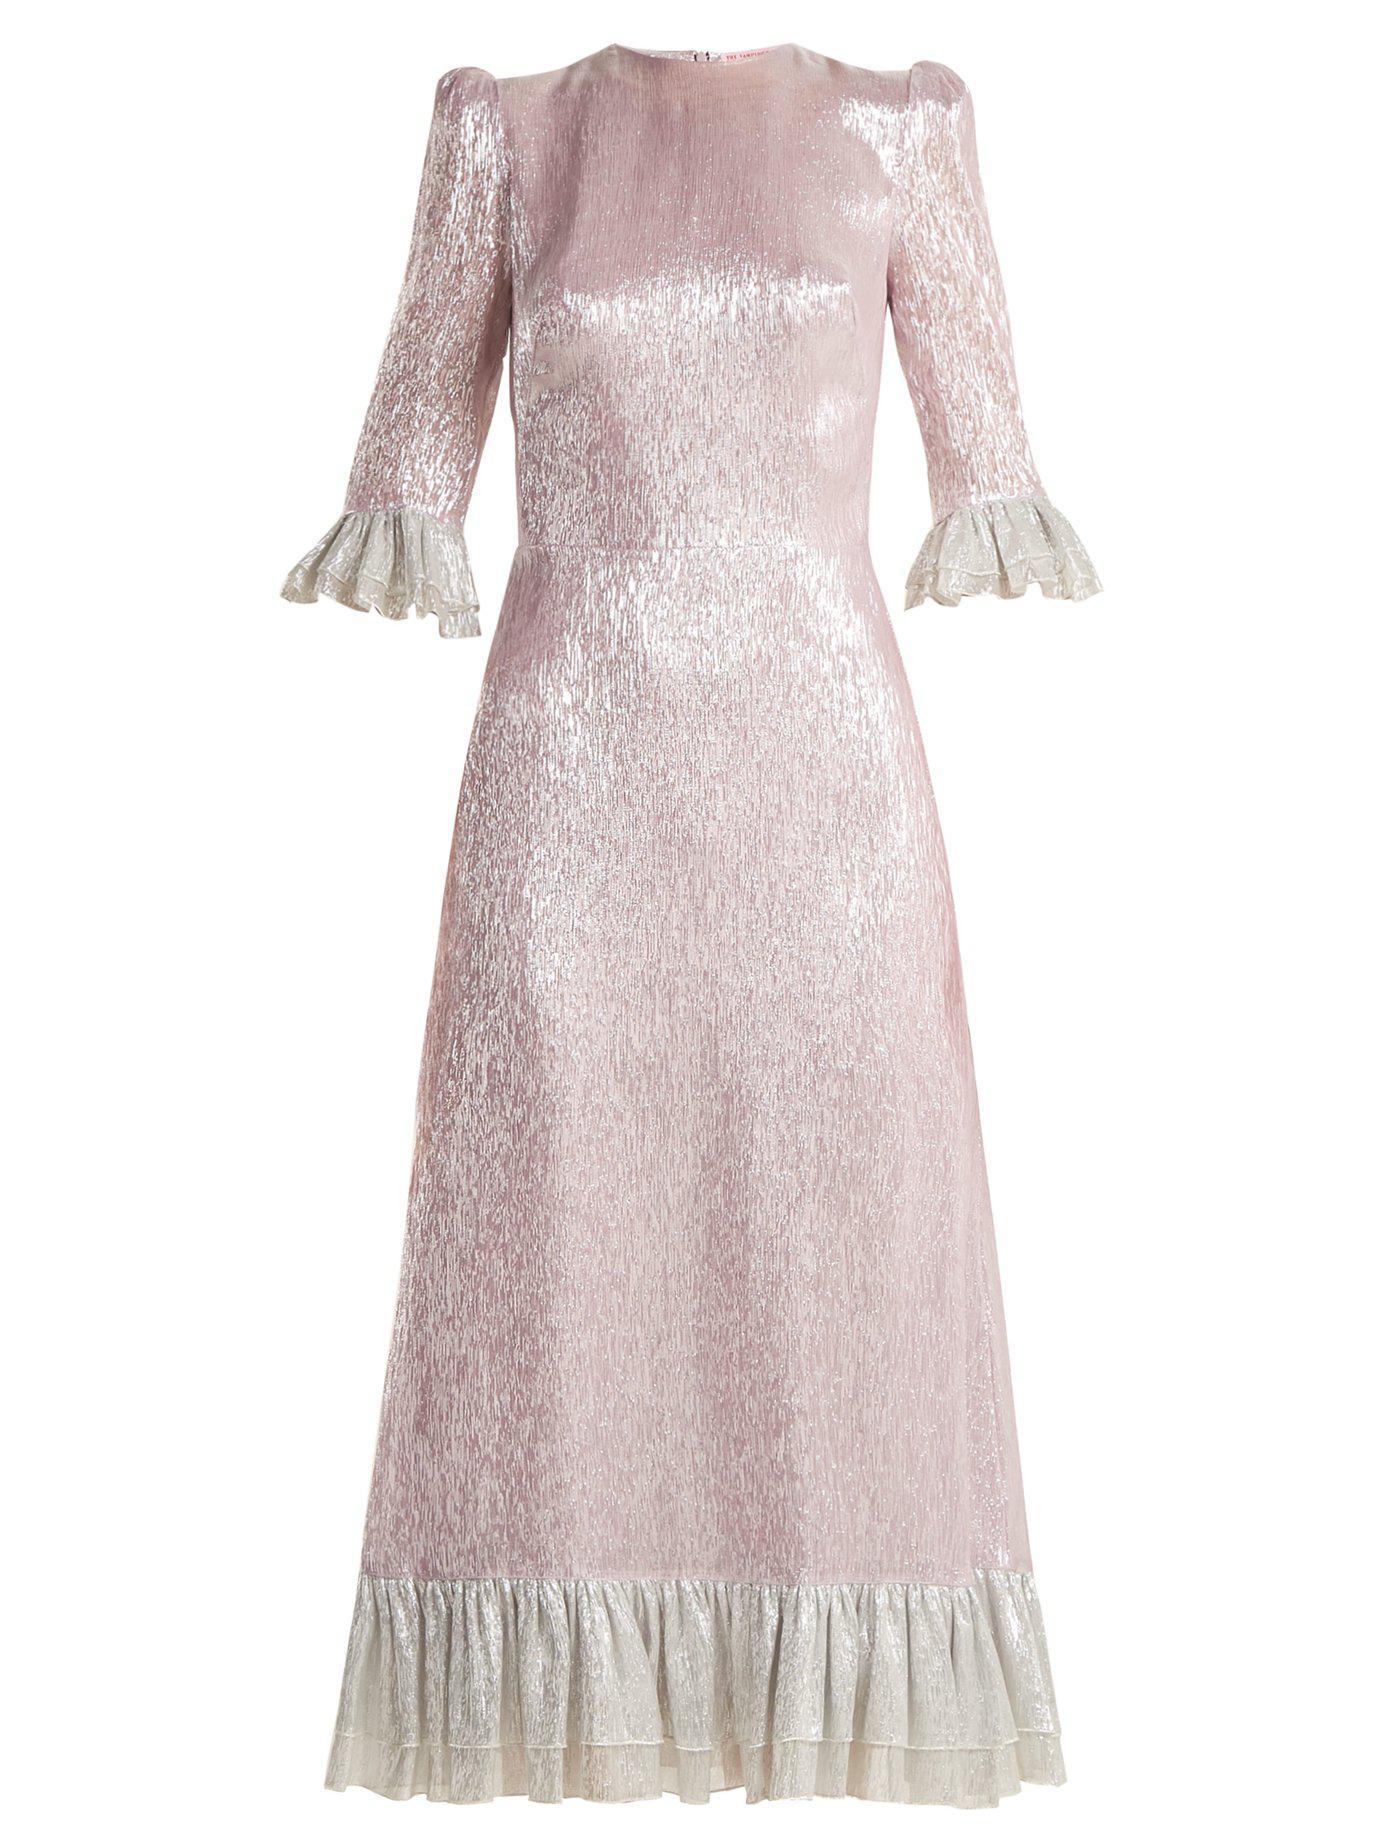 d6d9042451c2 The Vampire's Wife Falconetti Ruffle-trimmed Silk-blend Dress in ...